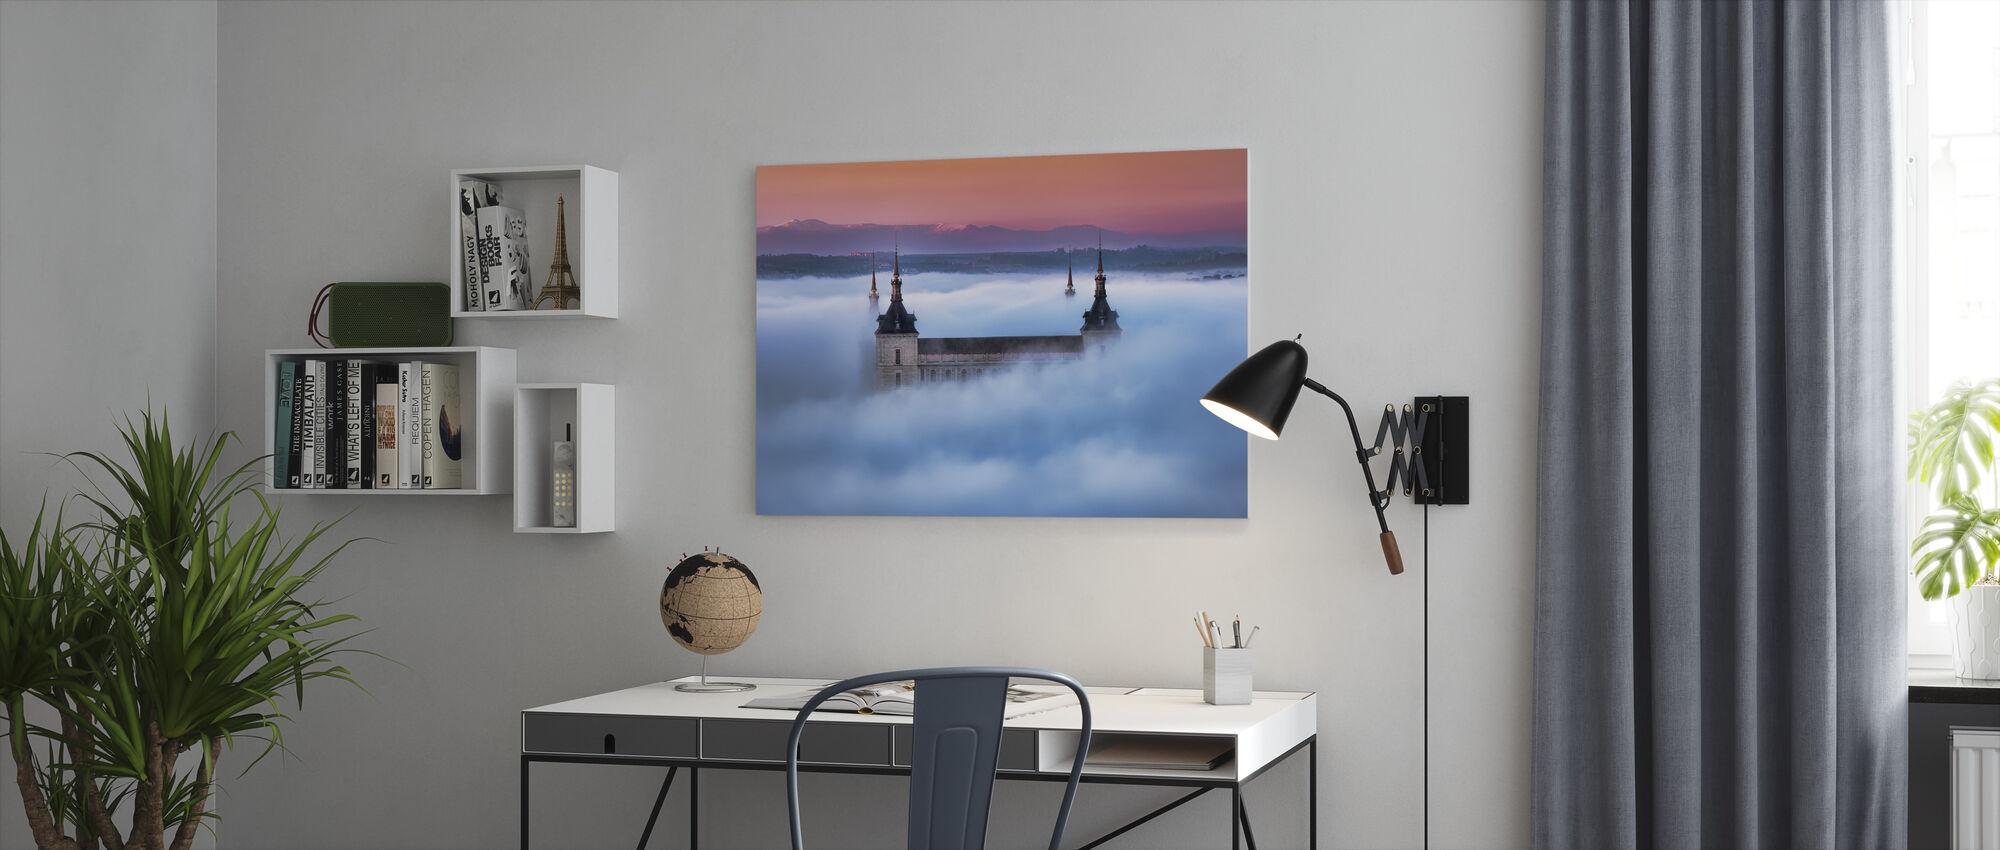 Toledo City Foggy Sunset - Canvas print - Office